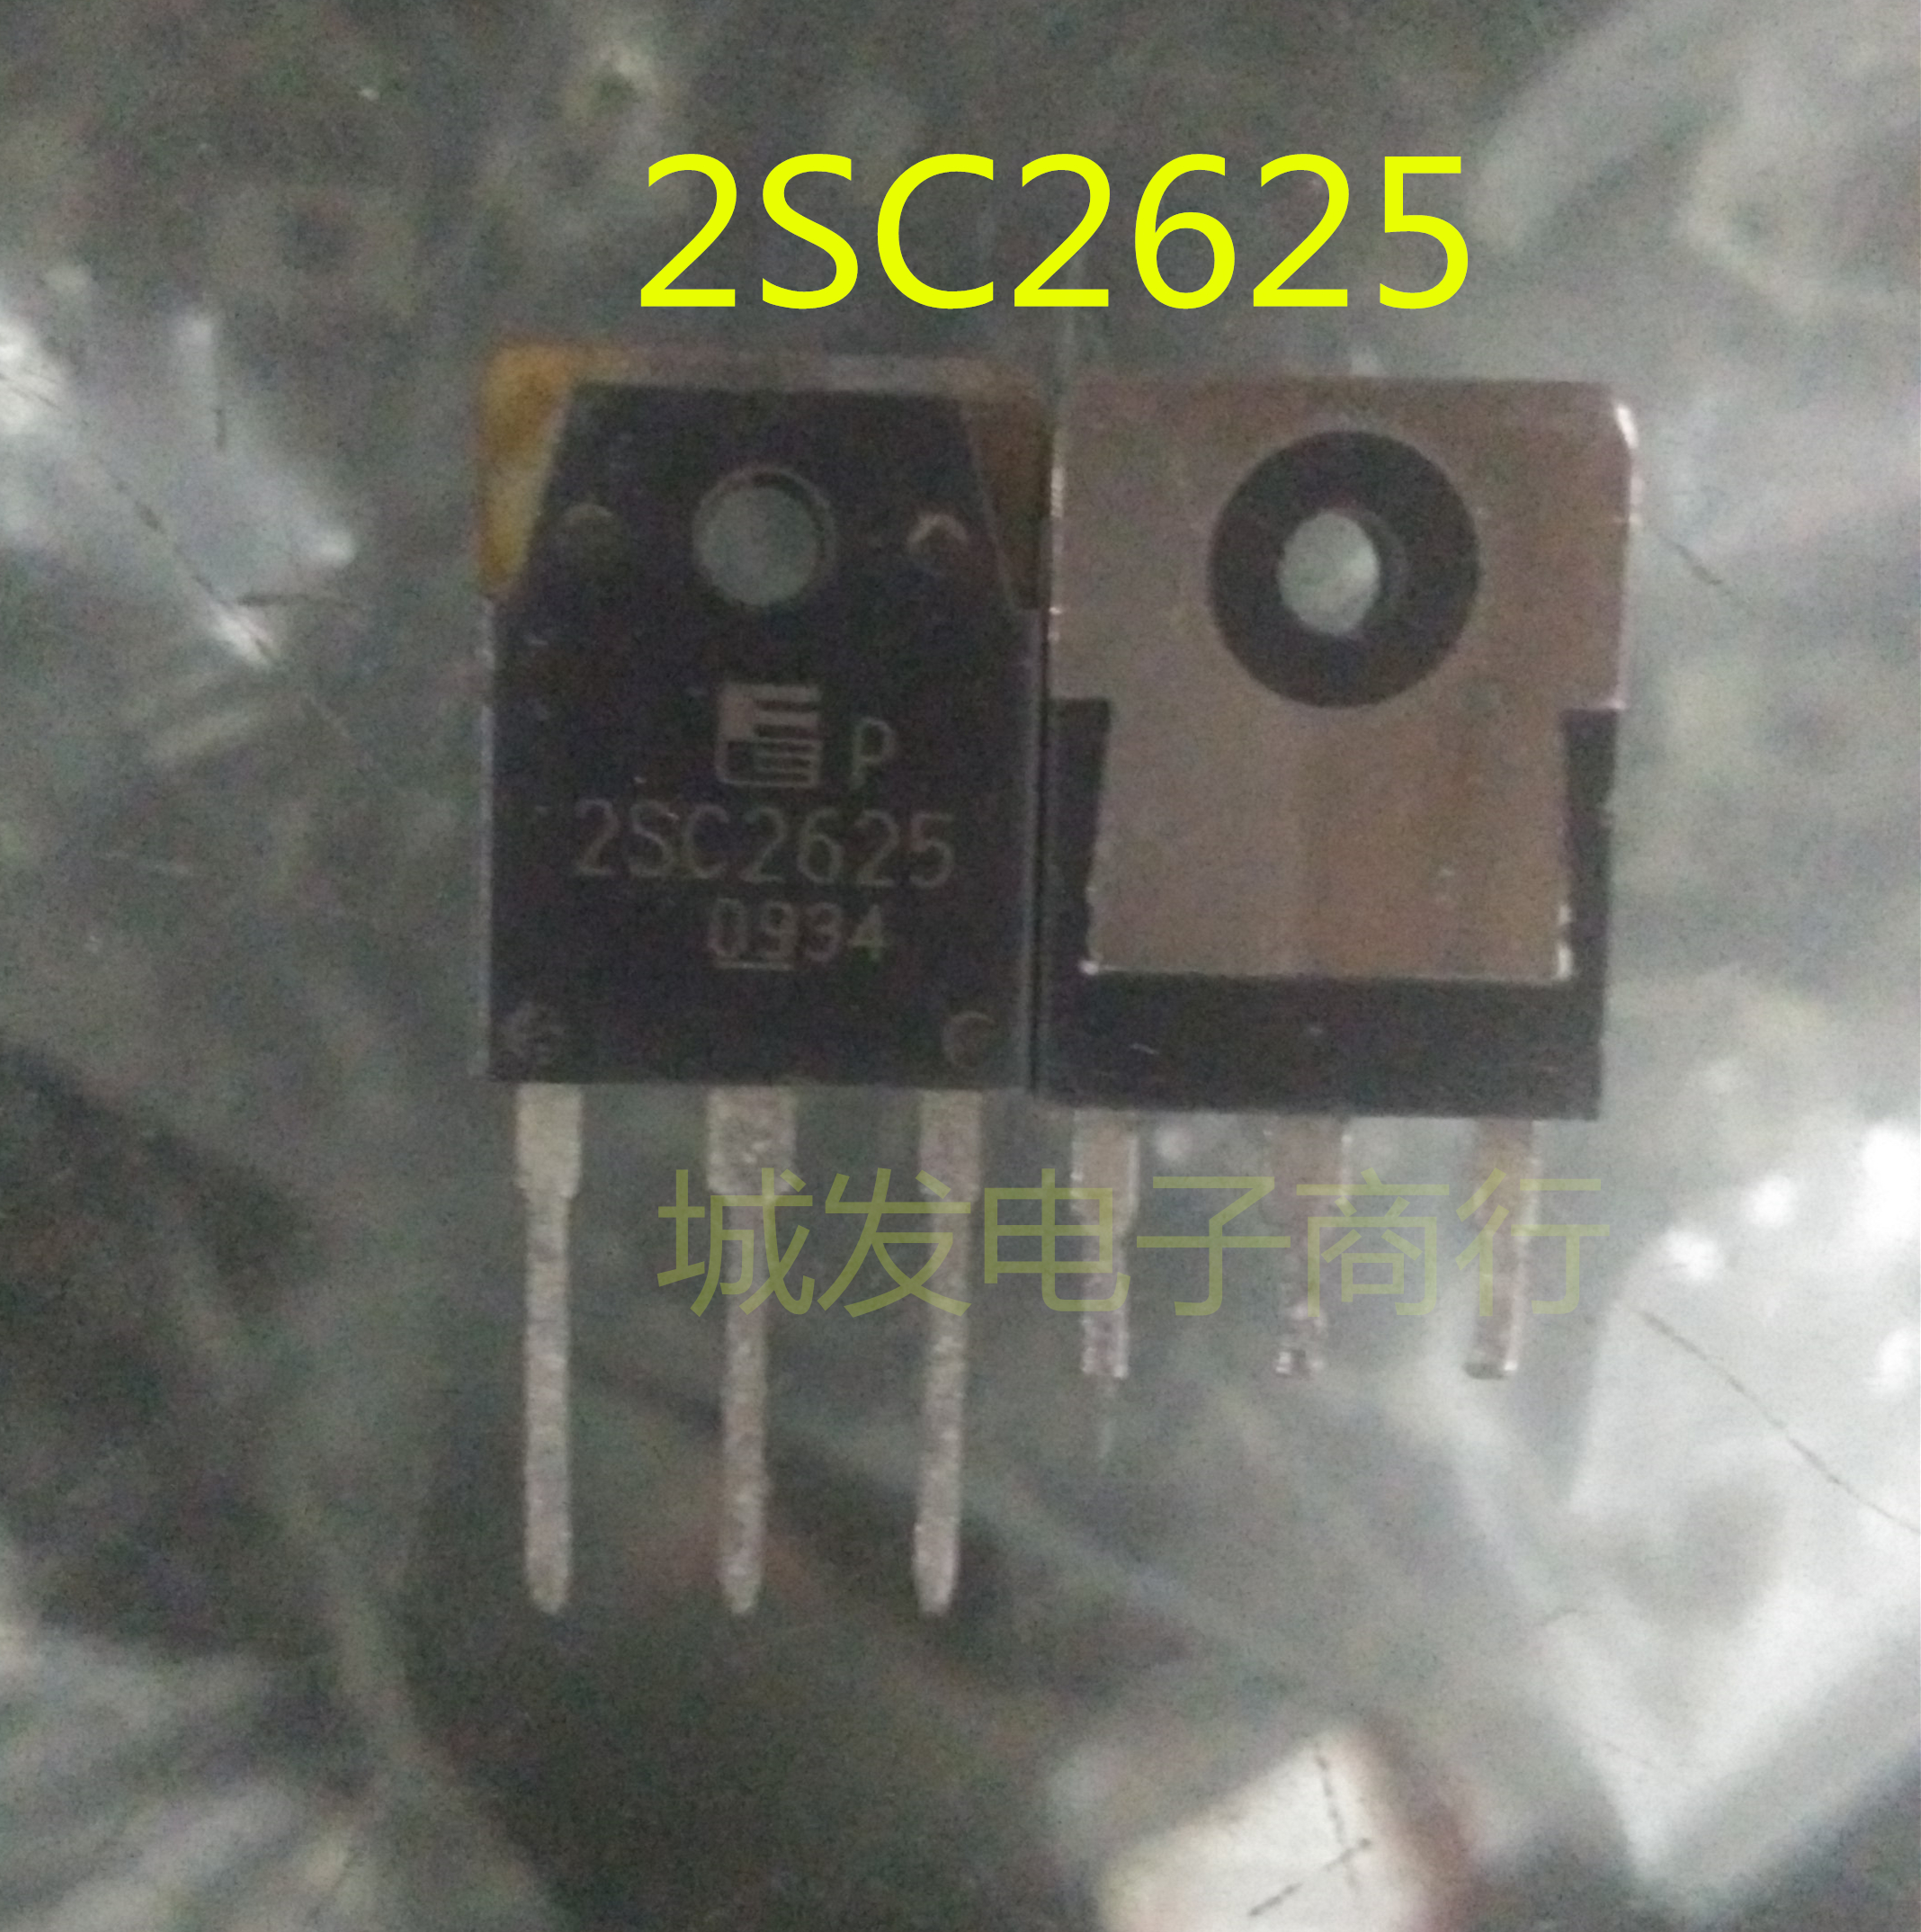 2SC2625C262510A450V สลับหลอดเพาเวอร์ฟูจิตสึในโรงงานเดิมที่จุดทดสอบ